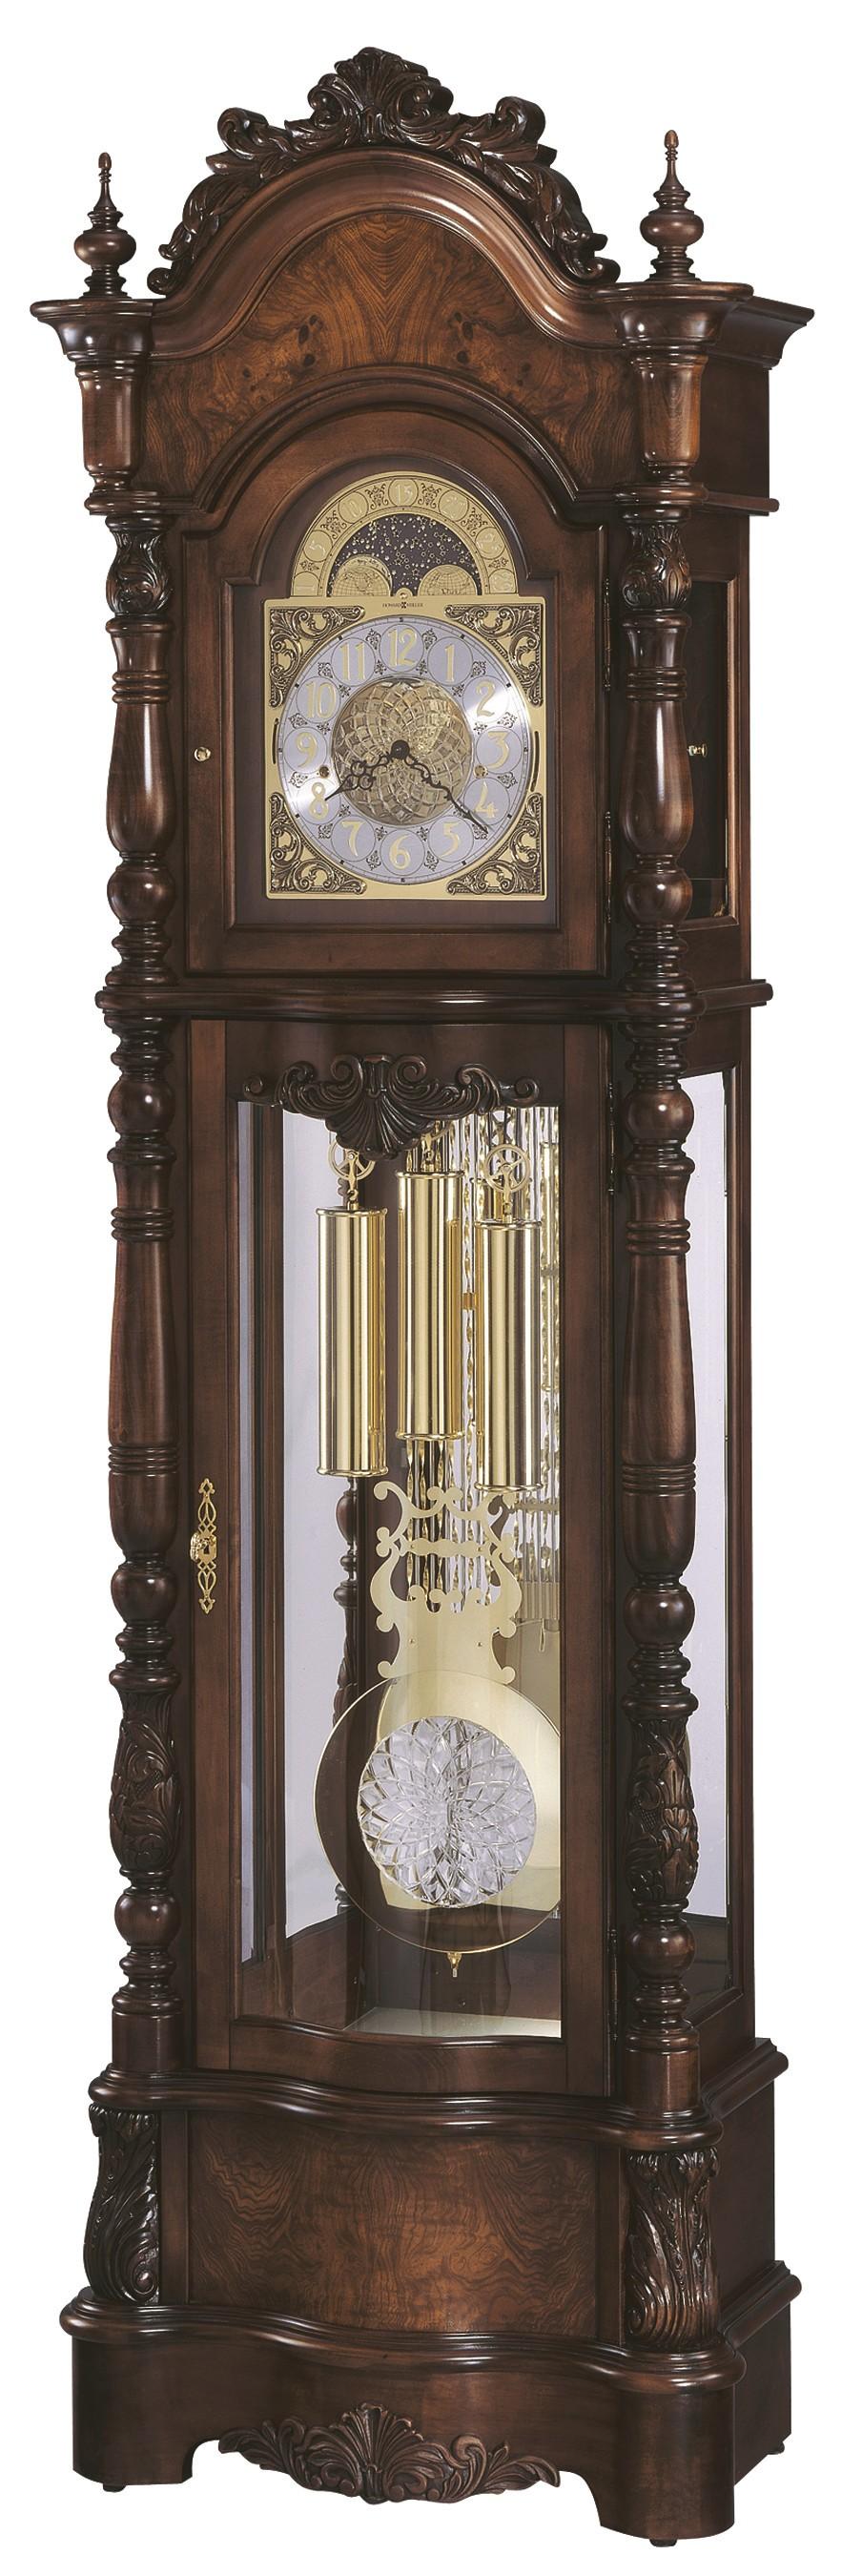 Image By Barb Lojwaniuk On Clocks Grandfather Clock Victorian Furniture